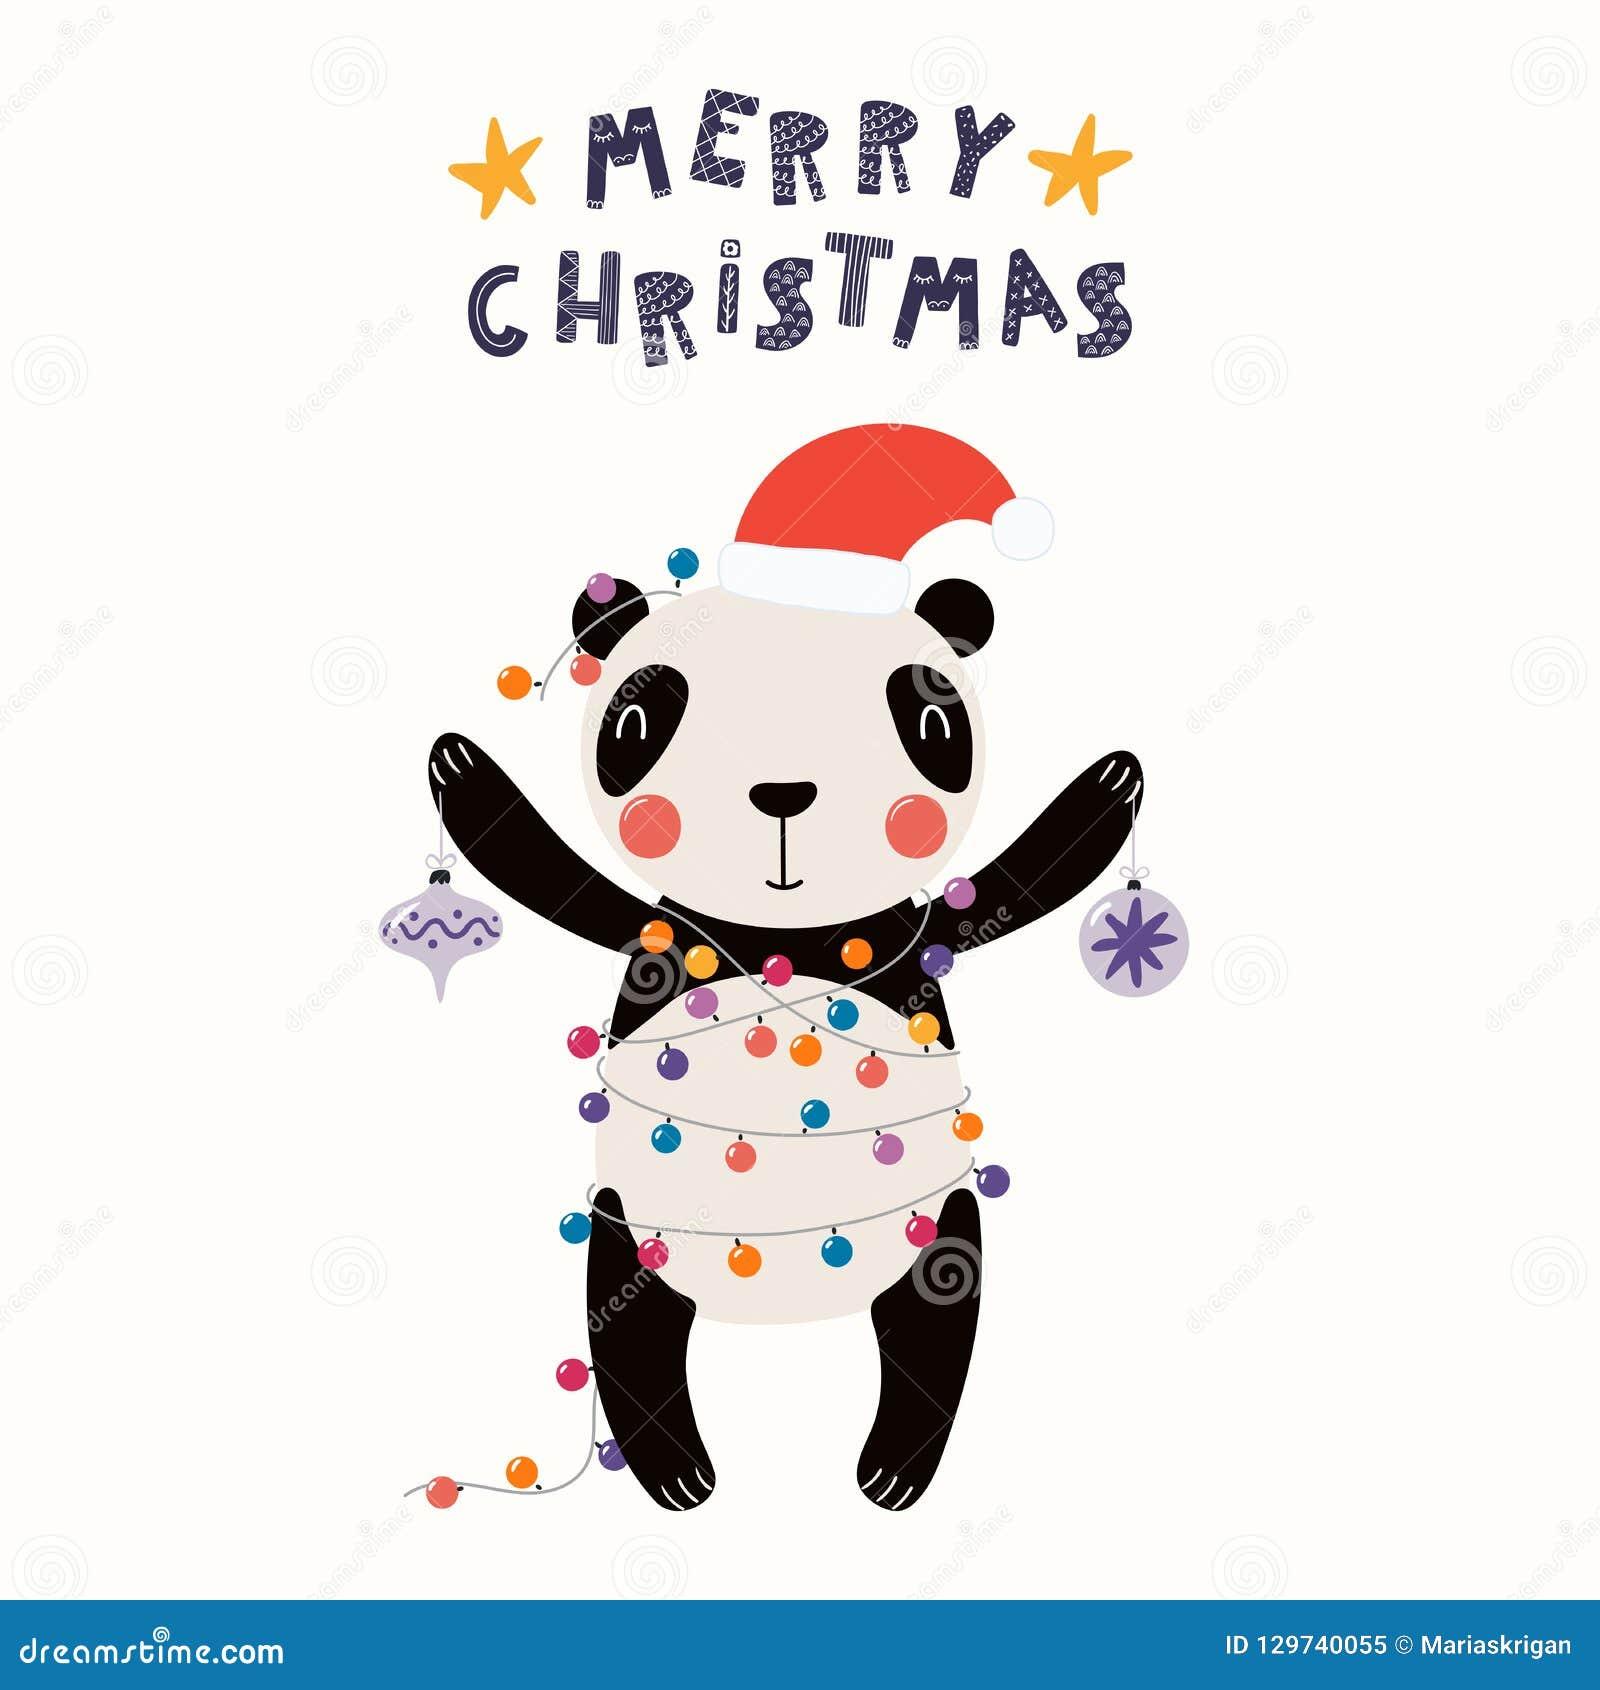 Cute panda Christmas card stock vector. Illustration of card - 129740055